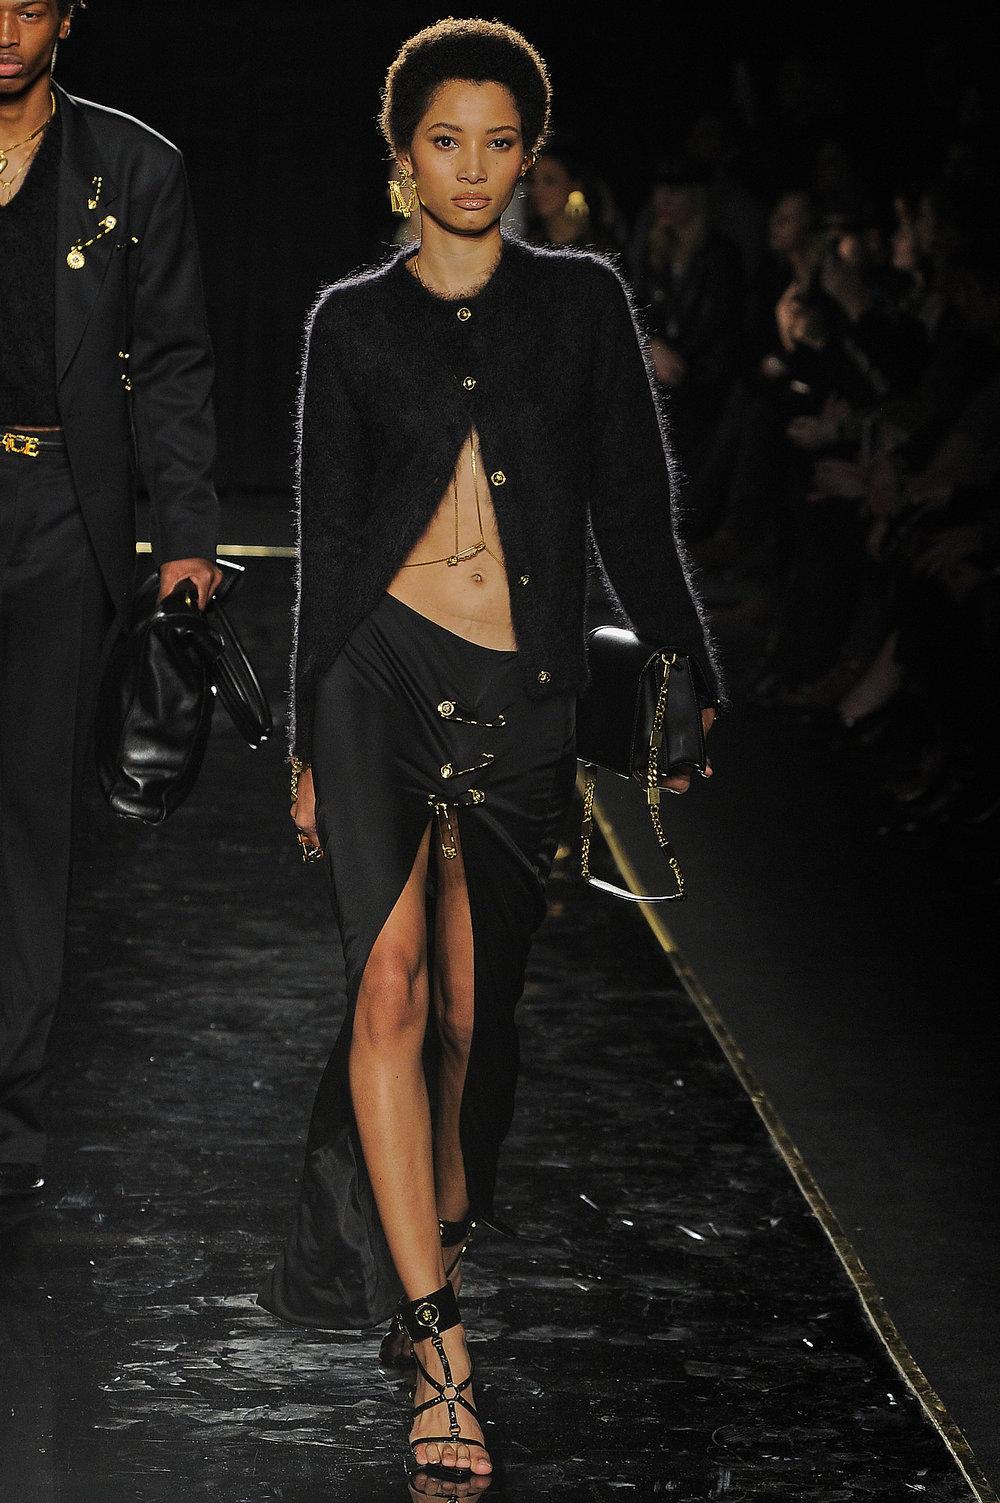 Versace_18_8c_versace_runway_runway_00018.jpg